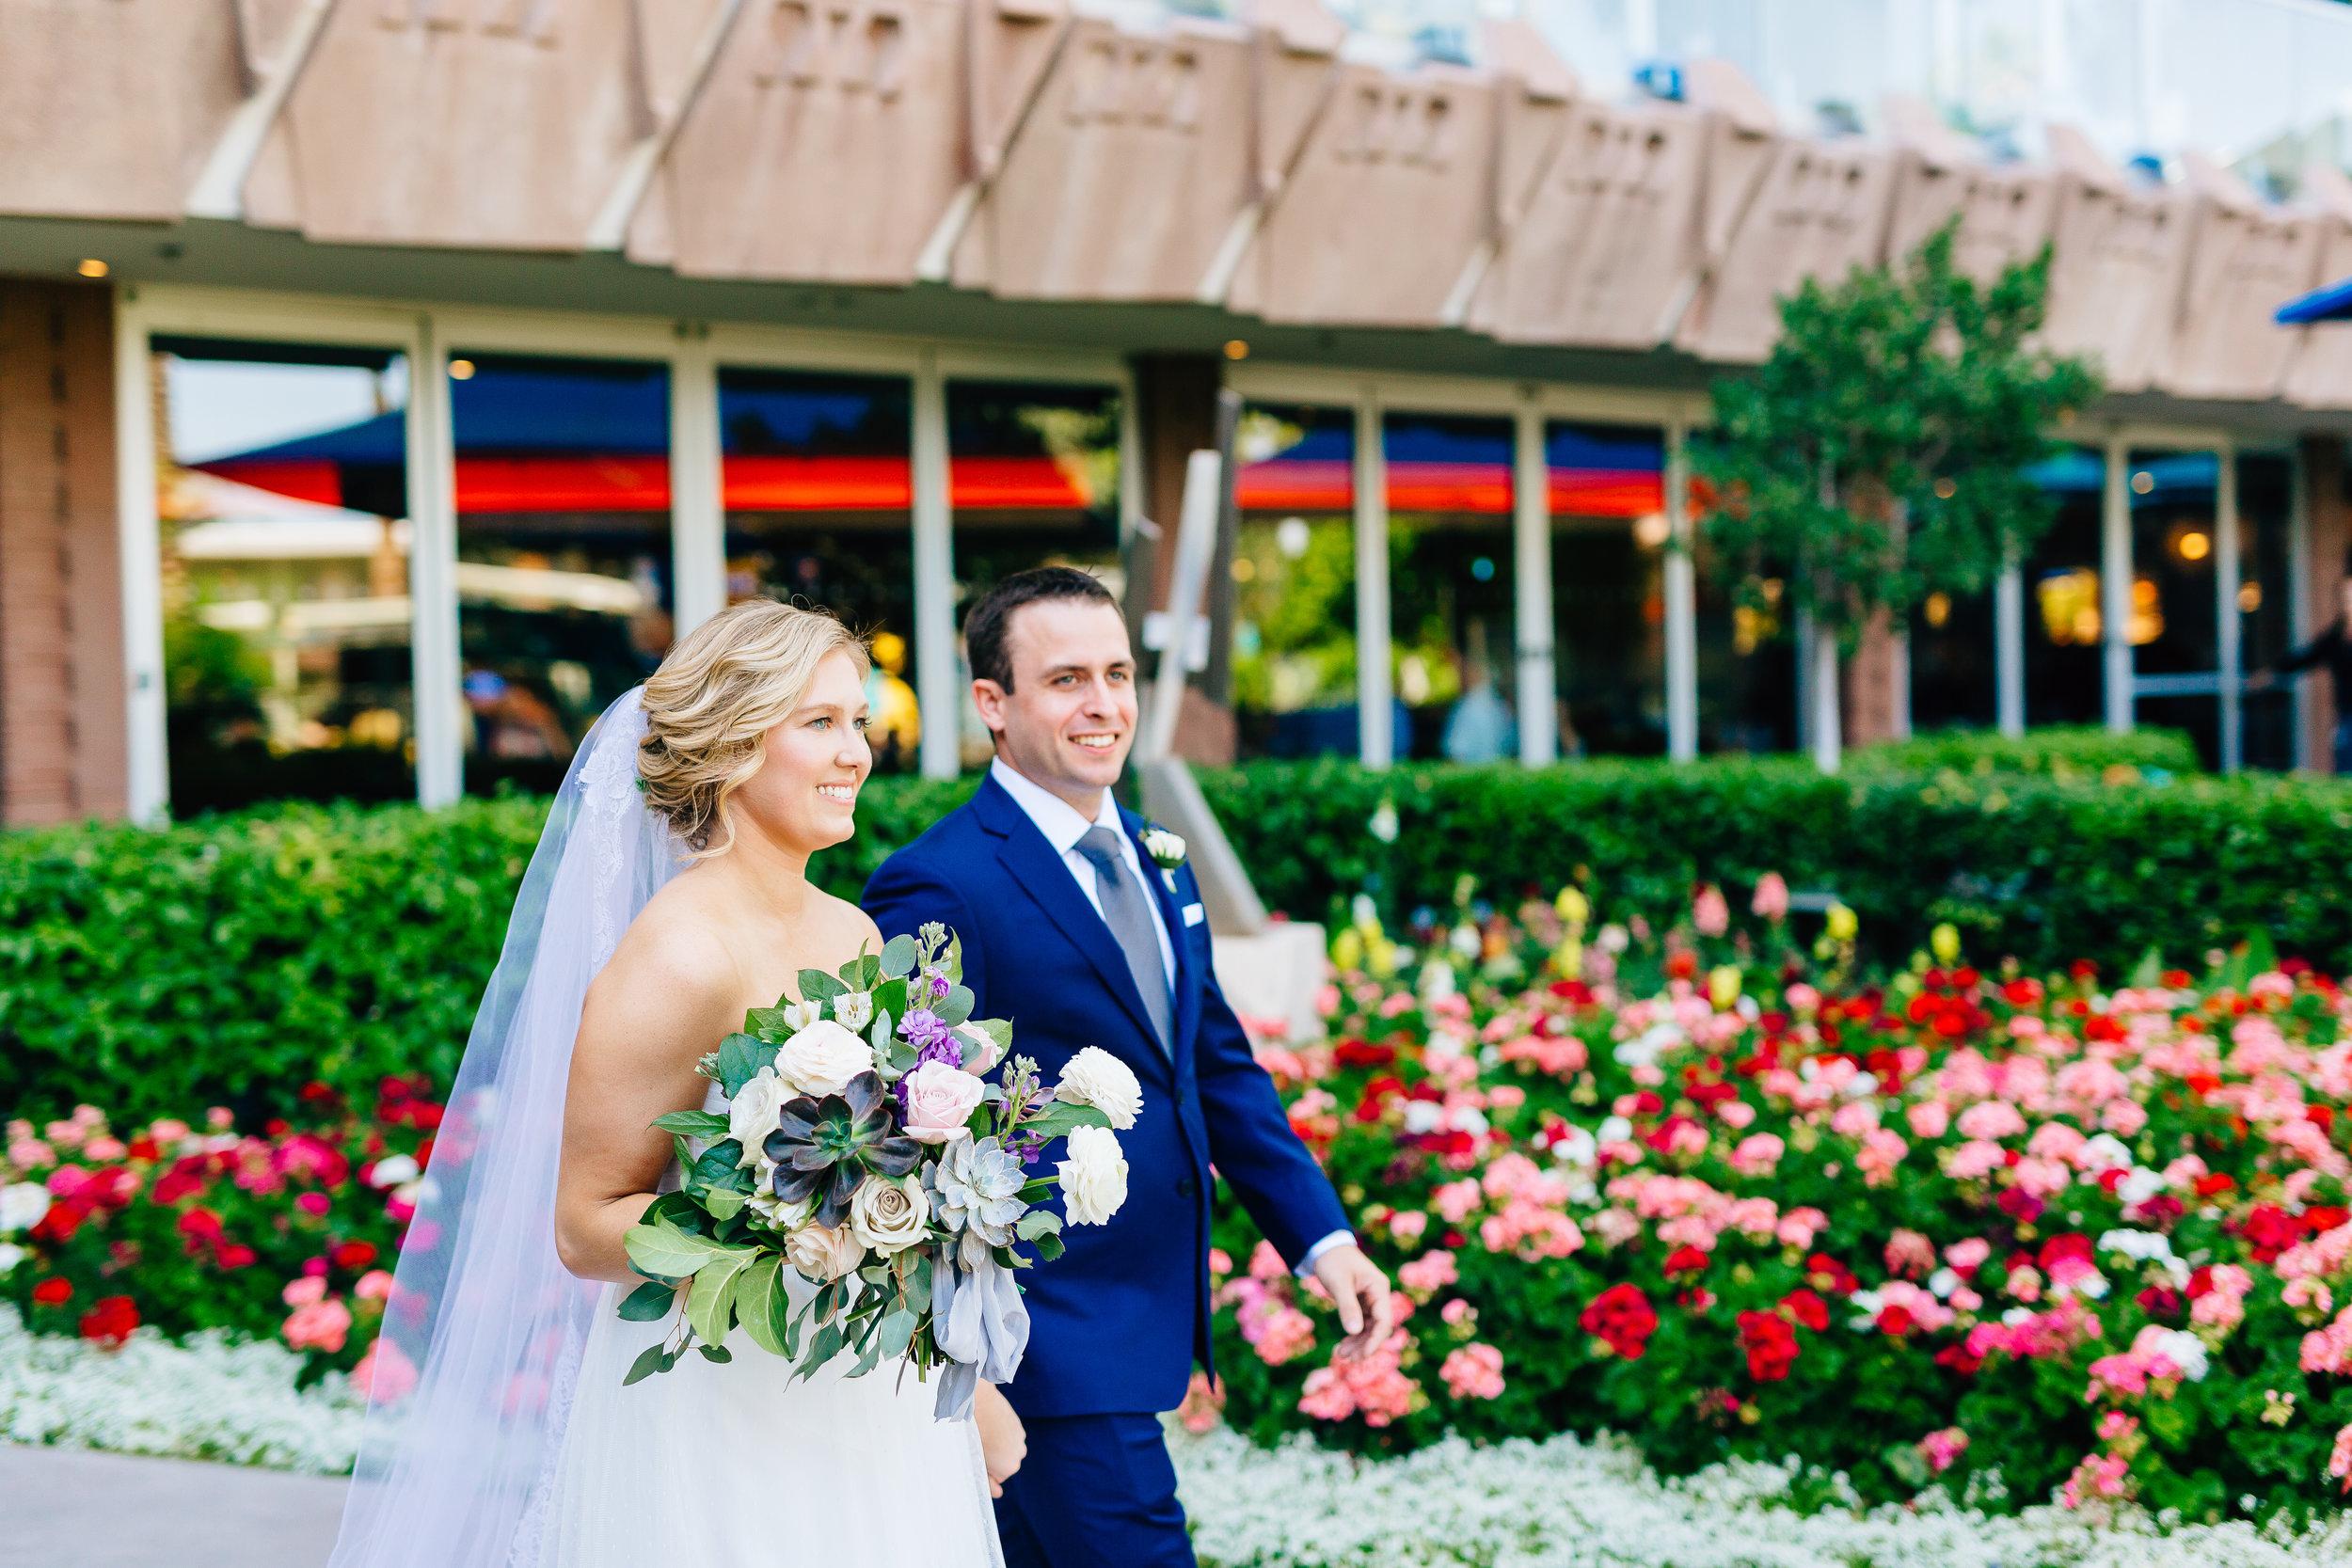 Liz+Mike-HotelValleyHo-Wedding-15Apr2017-109.jpg